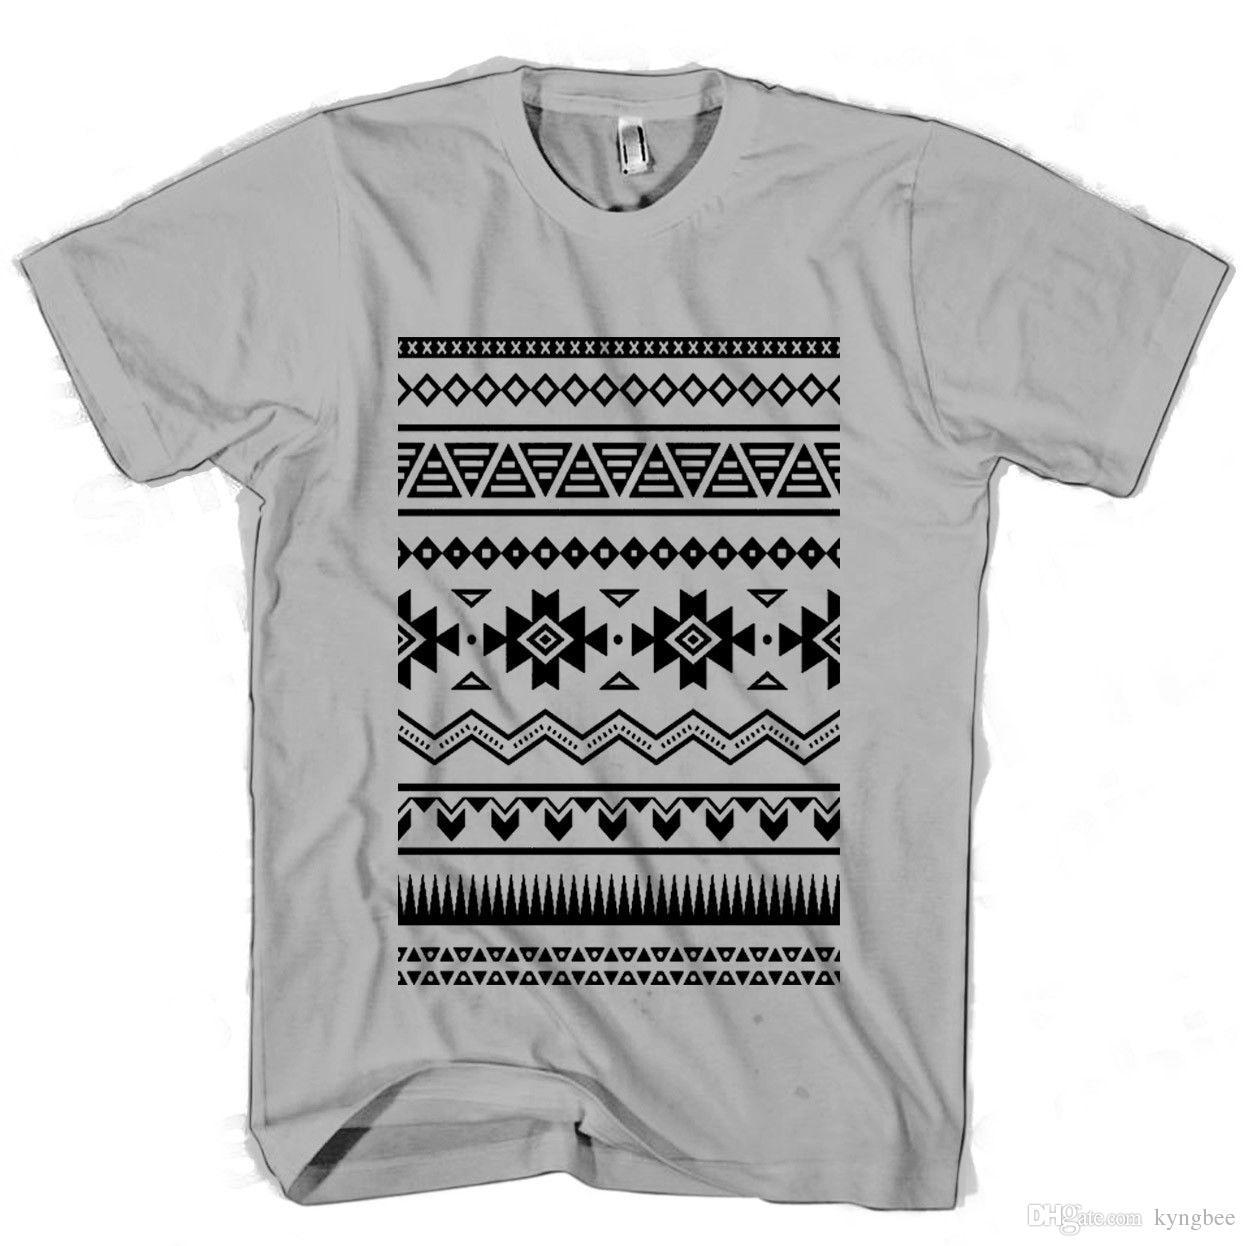 04a41251e7577 Compre Modelo Azteca Hombre   Camiseta De Mujer A  10.72 Del Kyngbee ...